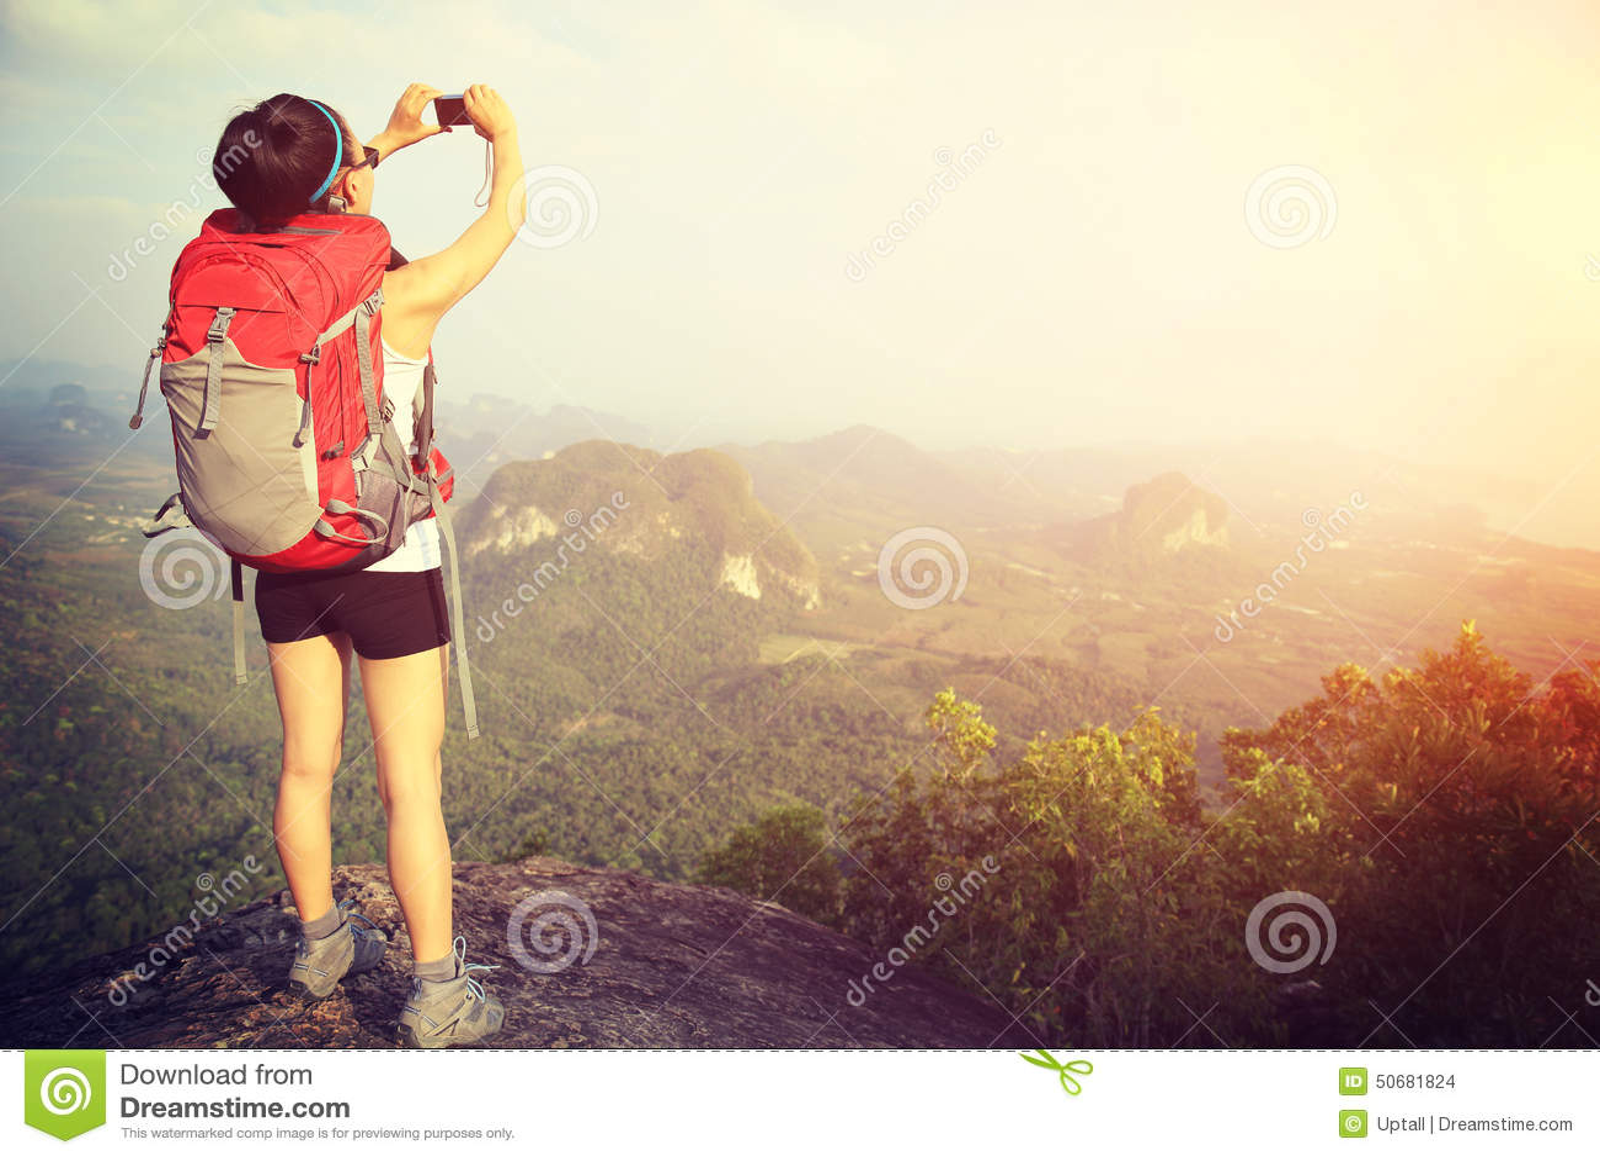 Download 拍照片的妇女远足者 库存照片. 图片 包括有 人员, 自由, 森林, 聚会所, 测试, 峭壁, 享受, 汉语 - 50681824